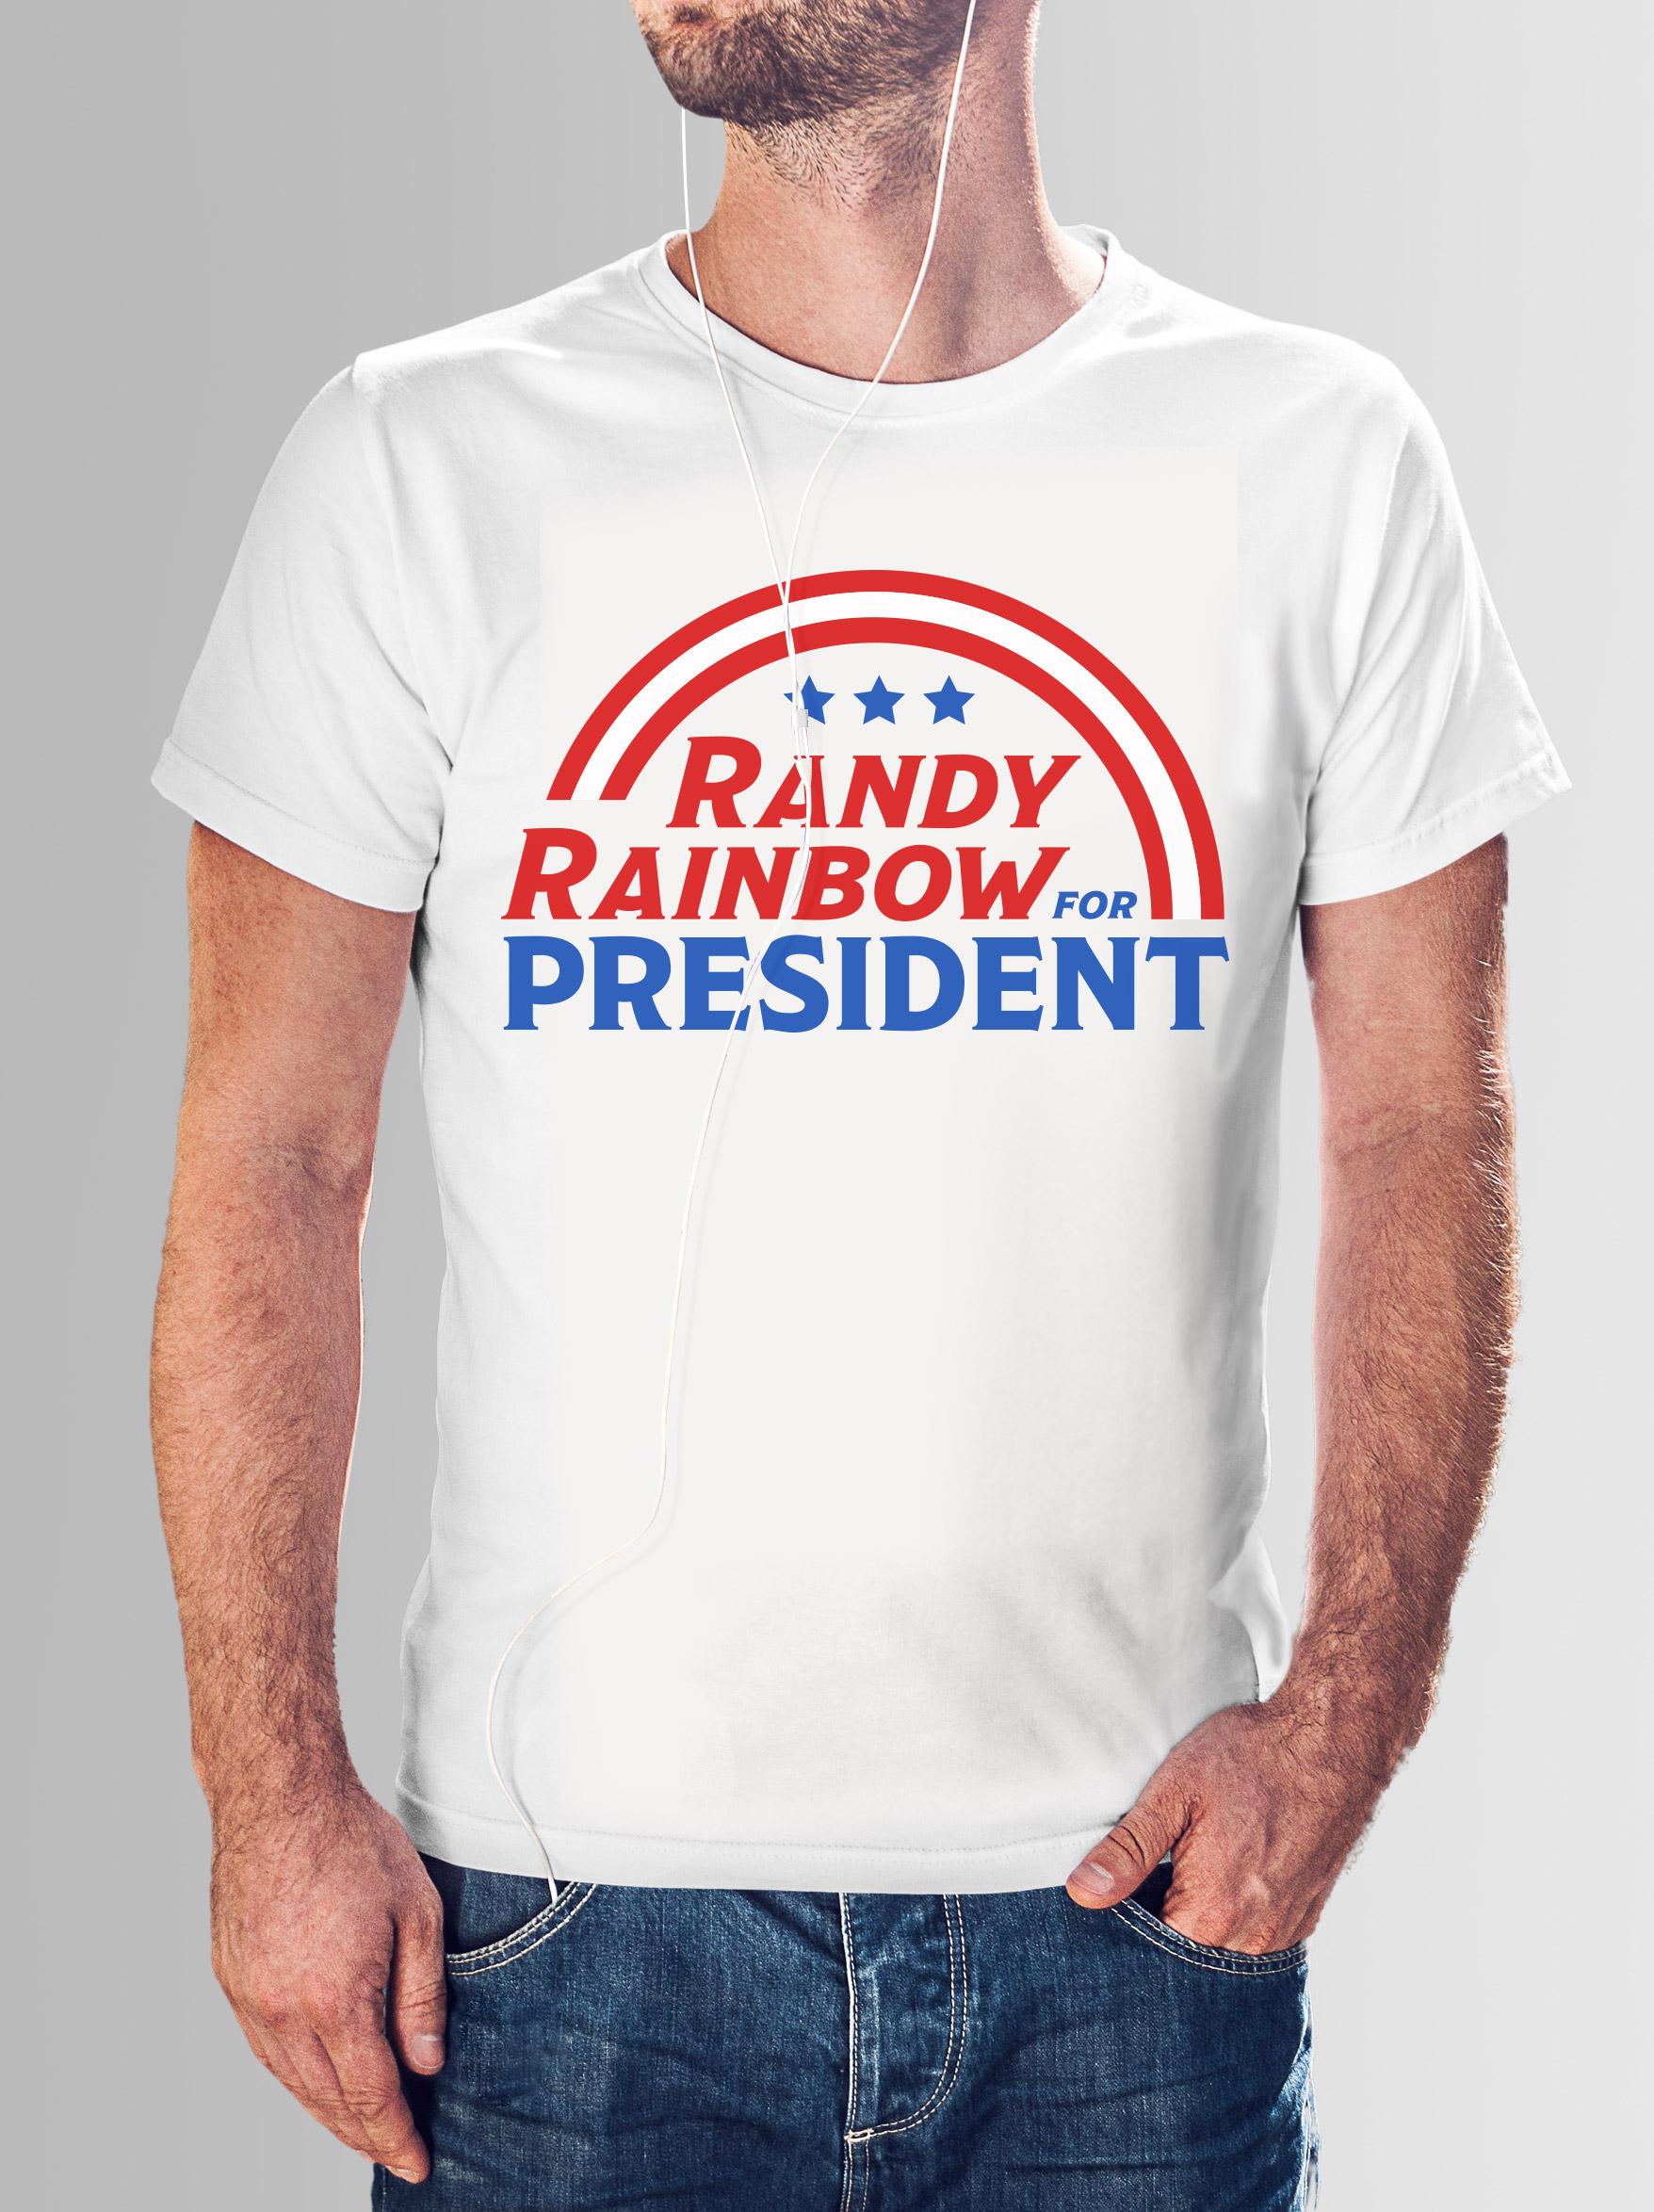 RR4Prez_shirt.jpg